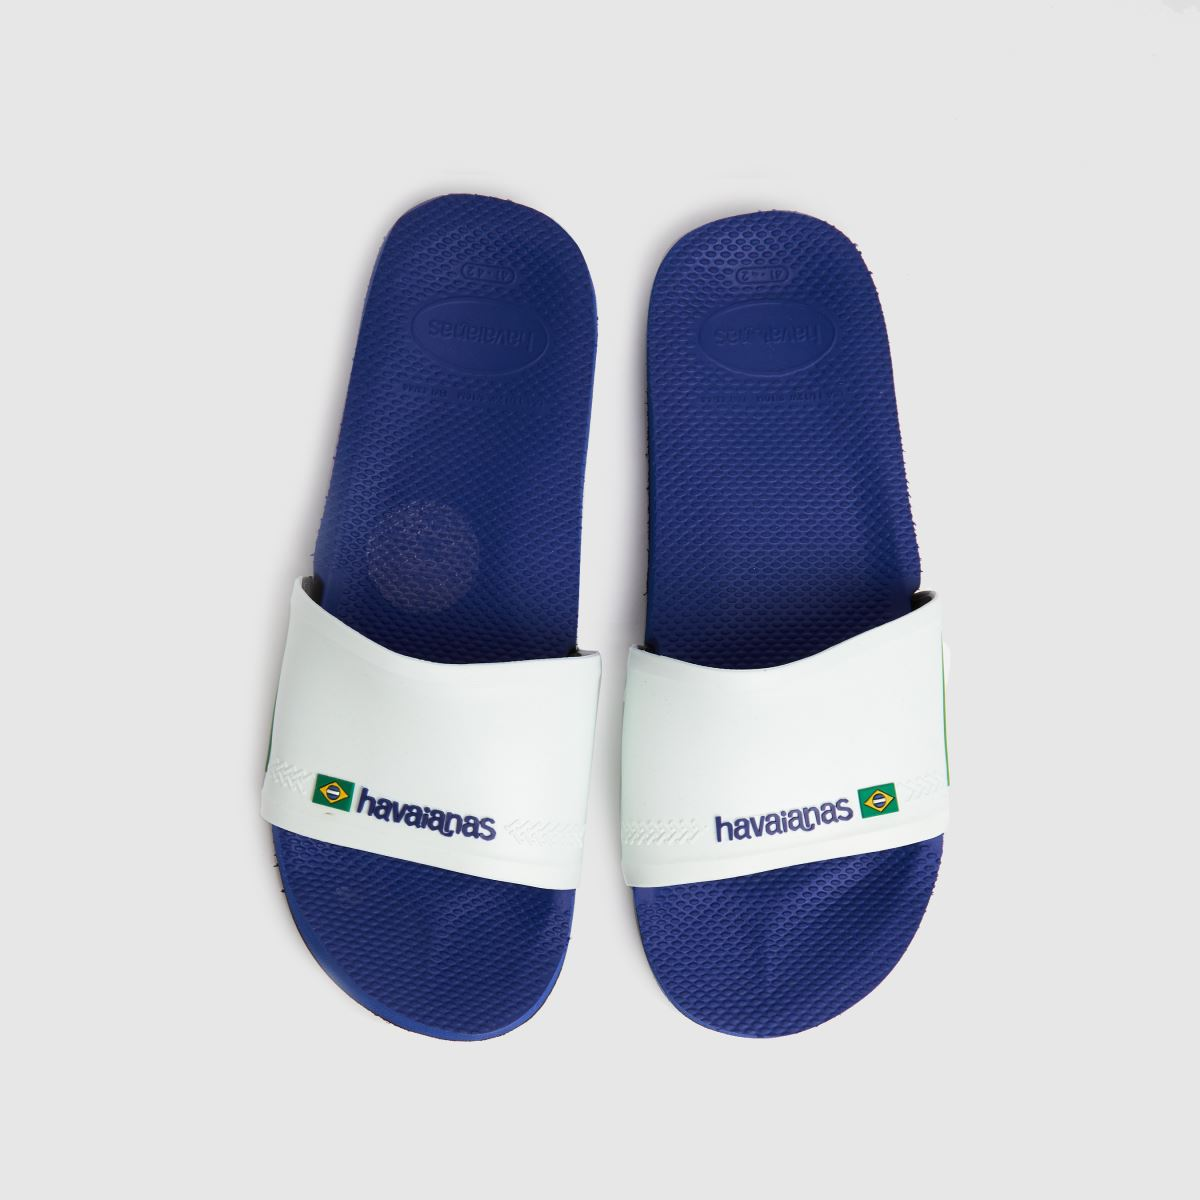 Havaianas White & Blue Slide Brasil Sandals